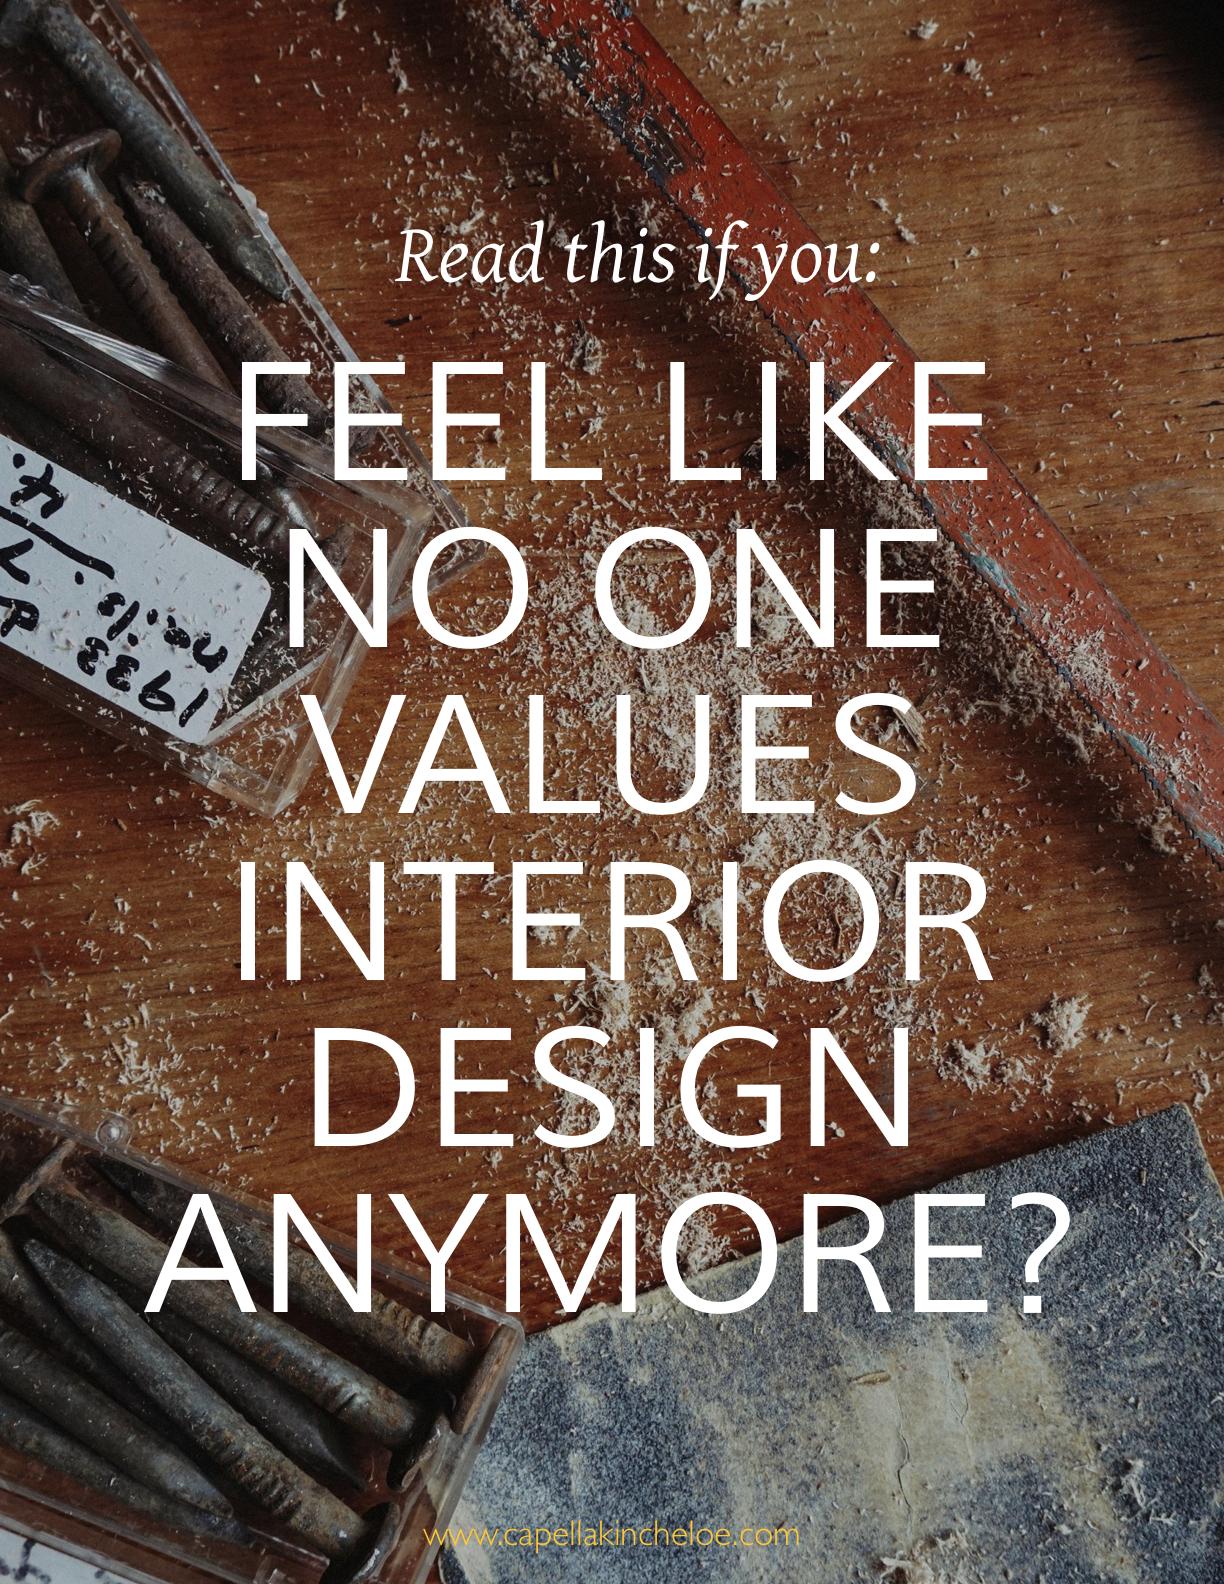 If you feel undervalued in your interior design career you need to read this. #interiordesignbusiness #interiordesignvalue #capellakincheloe #cktradesecrets